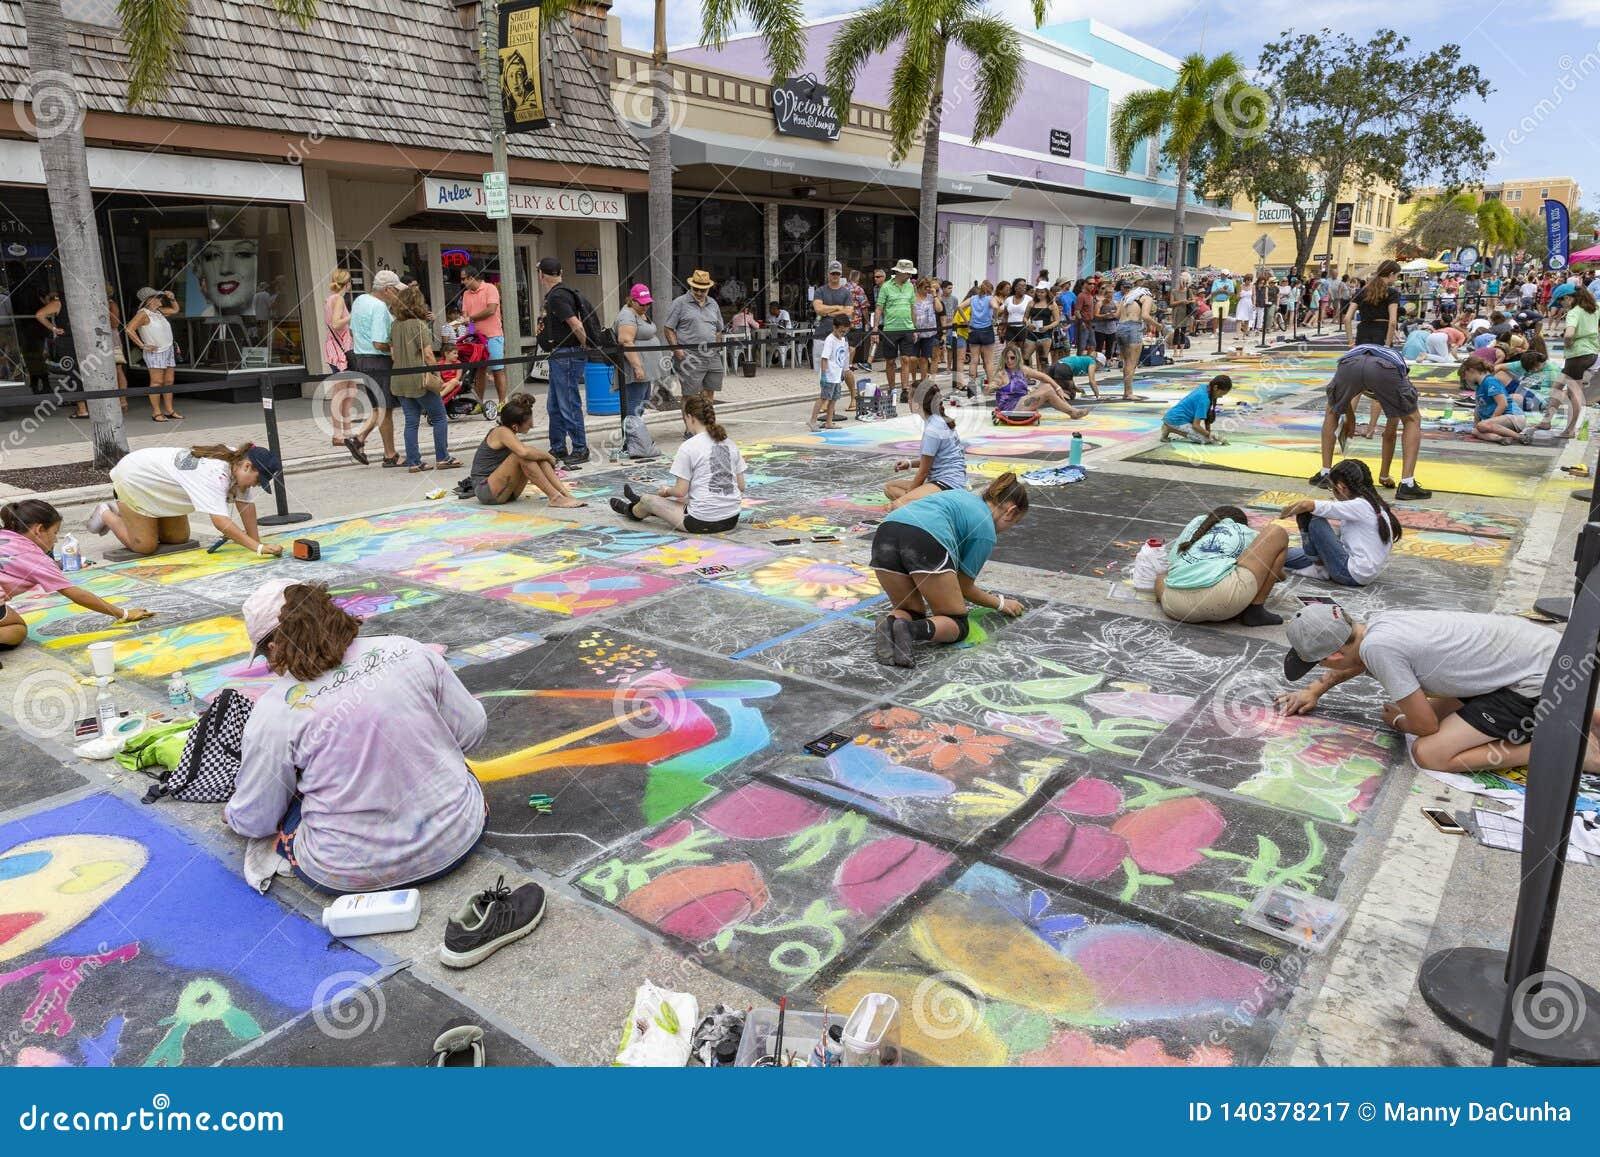 Valor del lago, la Florida, los E.E.U.U. 23-24 fabuloso, 25to Fest anual de la pintura de la calle 2019